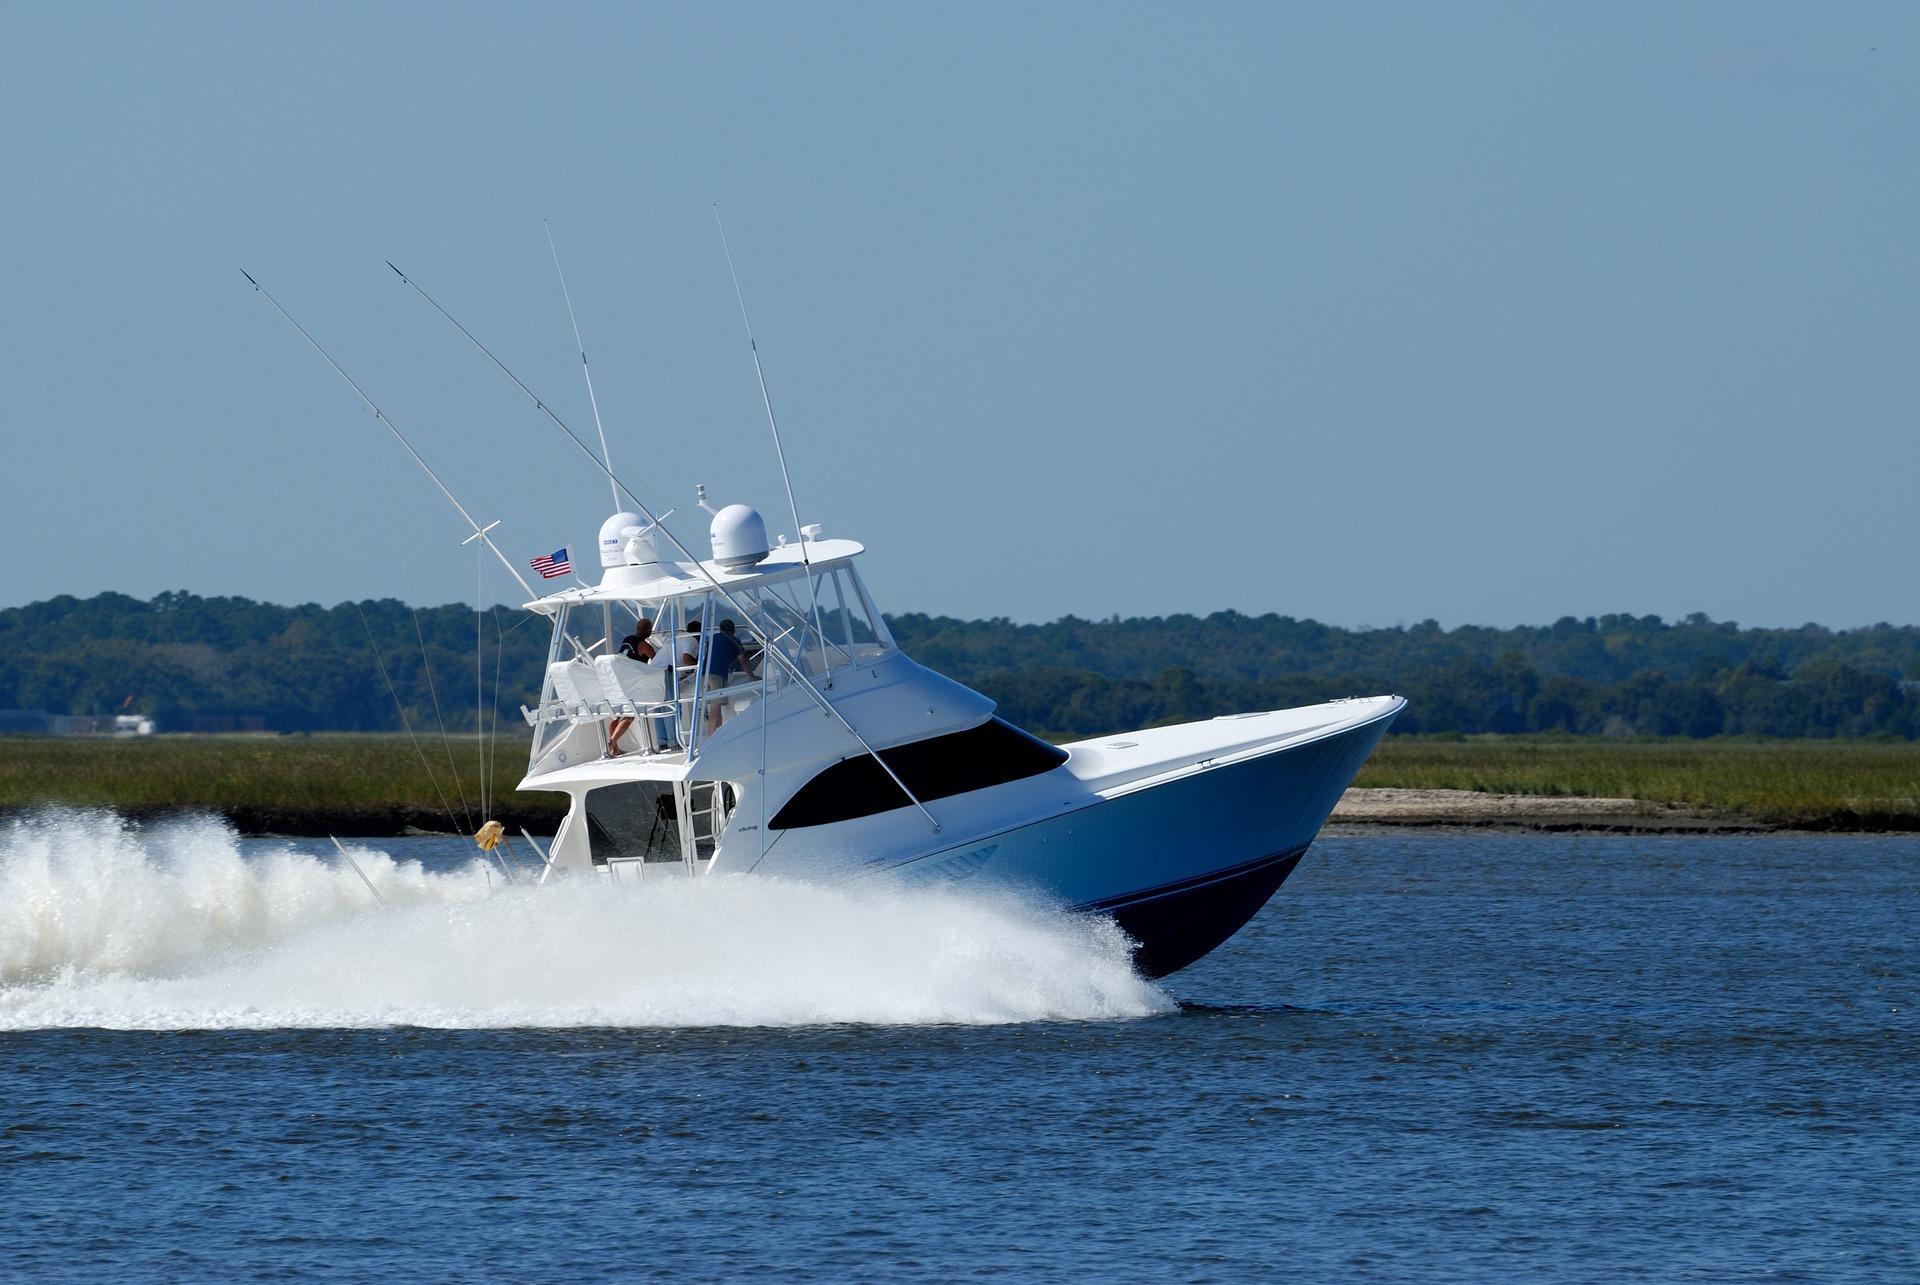 charter-fishing-2432946_1920.jpg